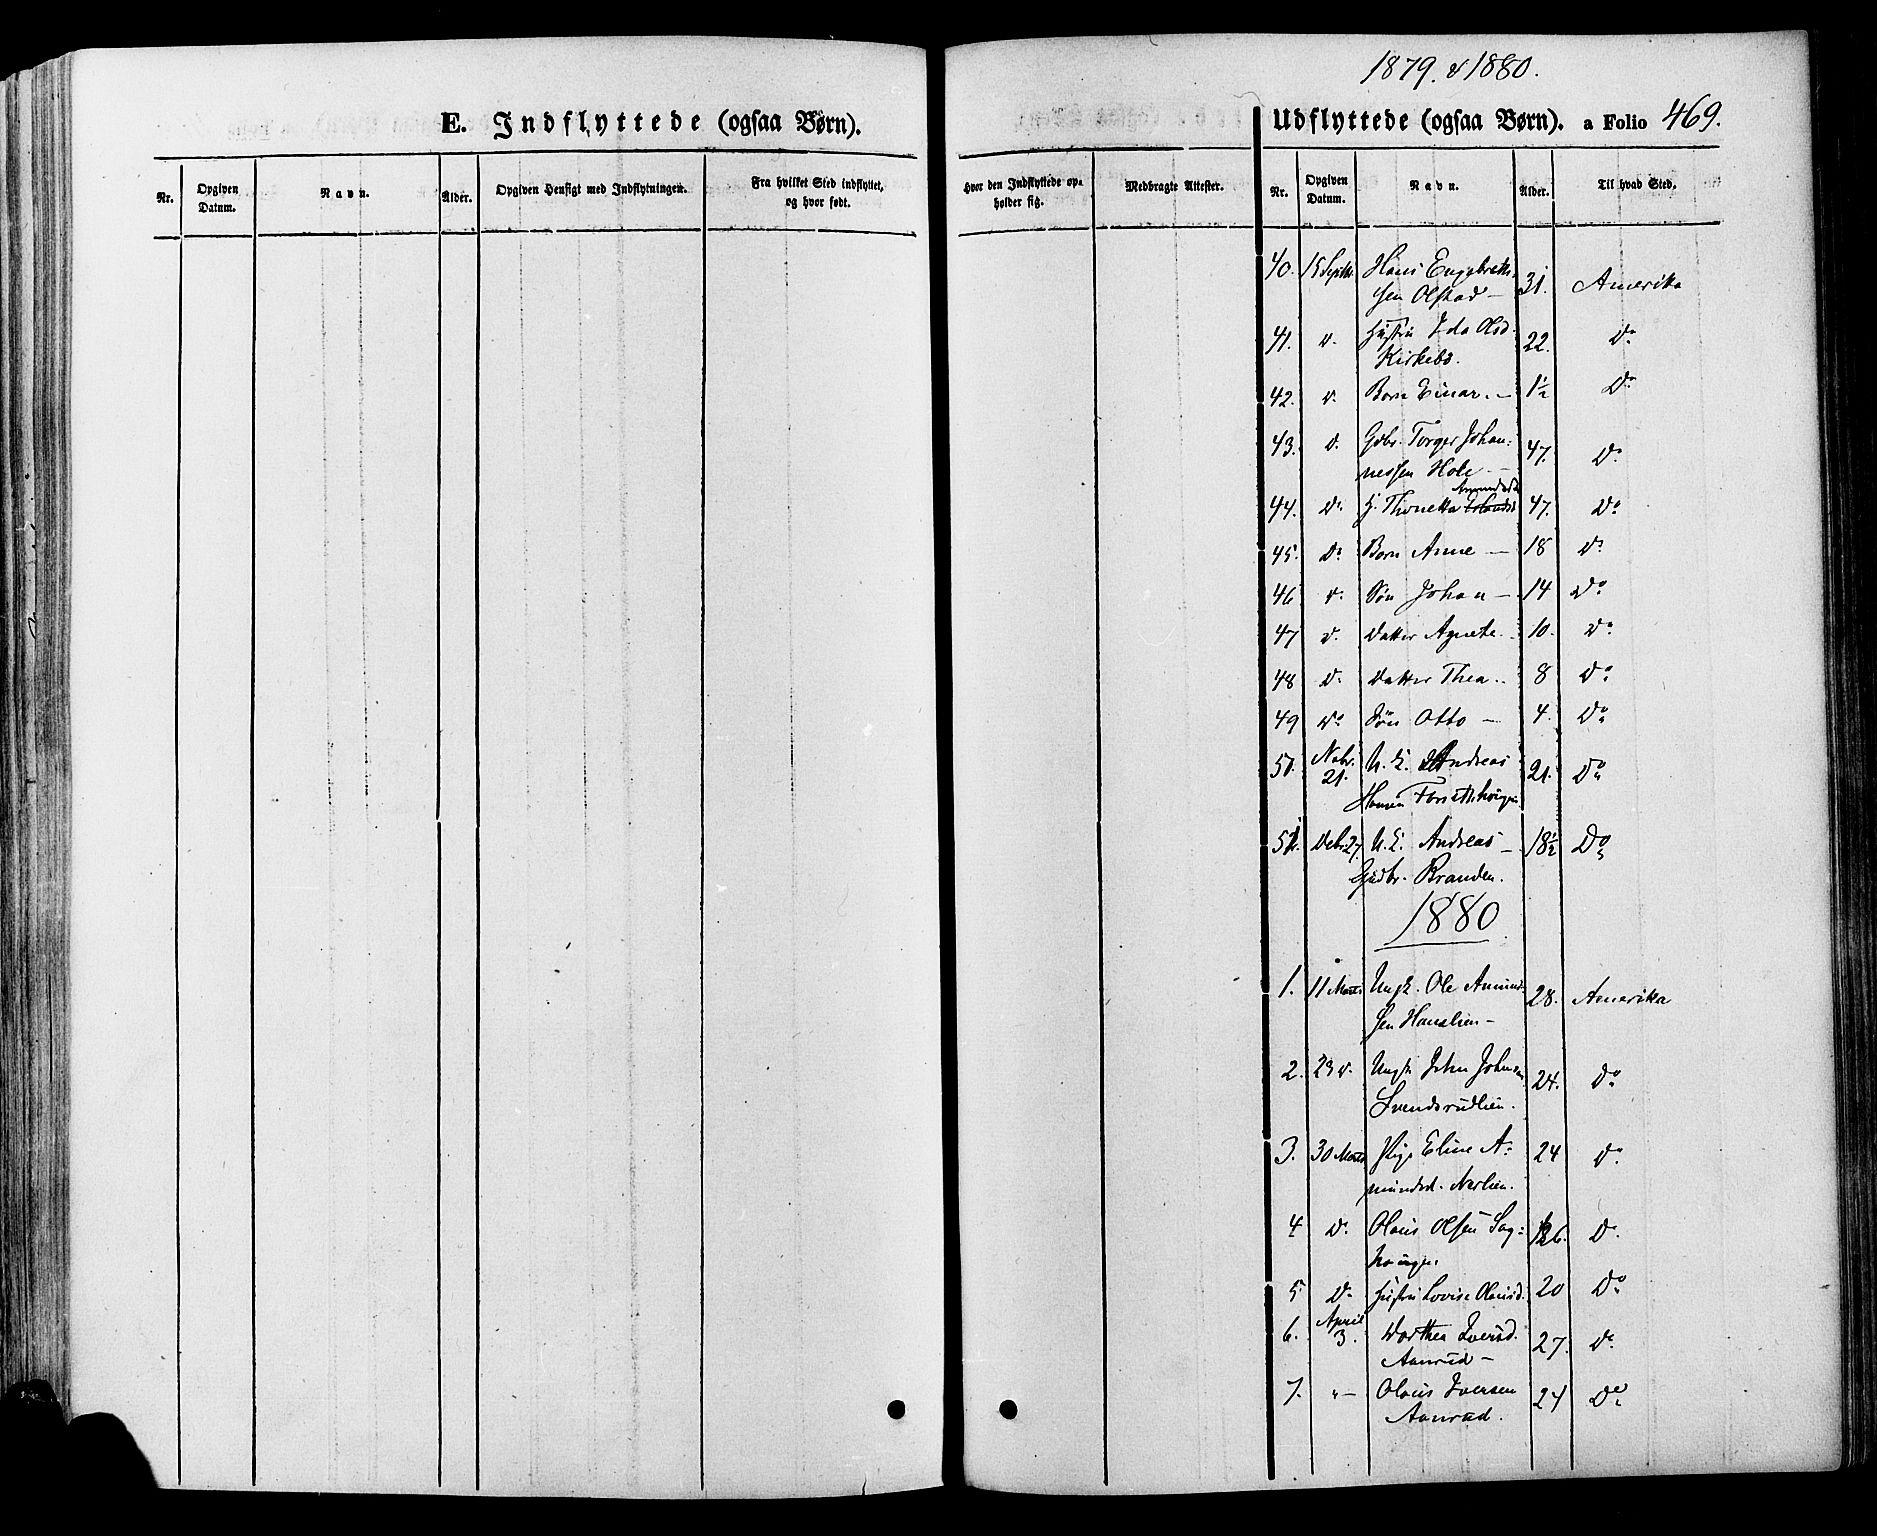 SAH, Gausdal prestekontor, Ministerialbok nr. 10, 1867-1886, s. 469